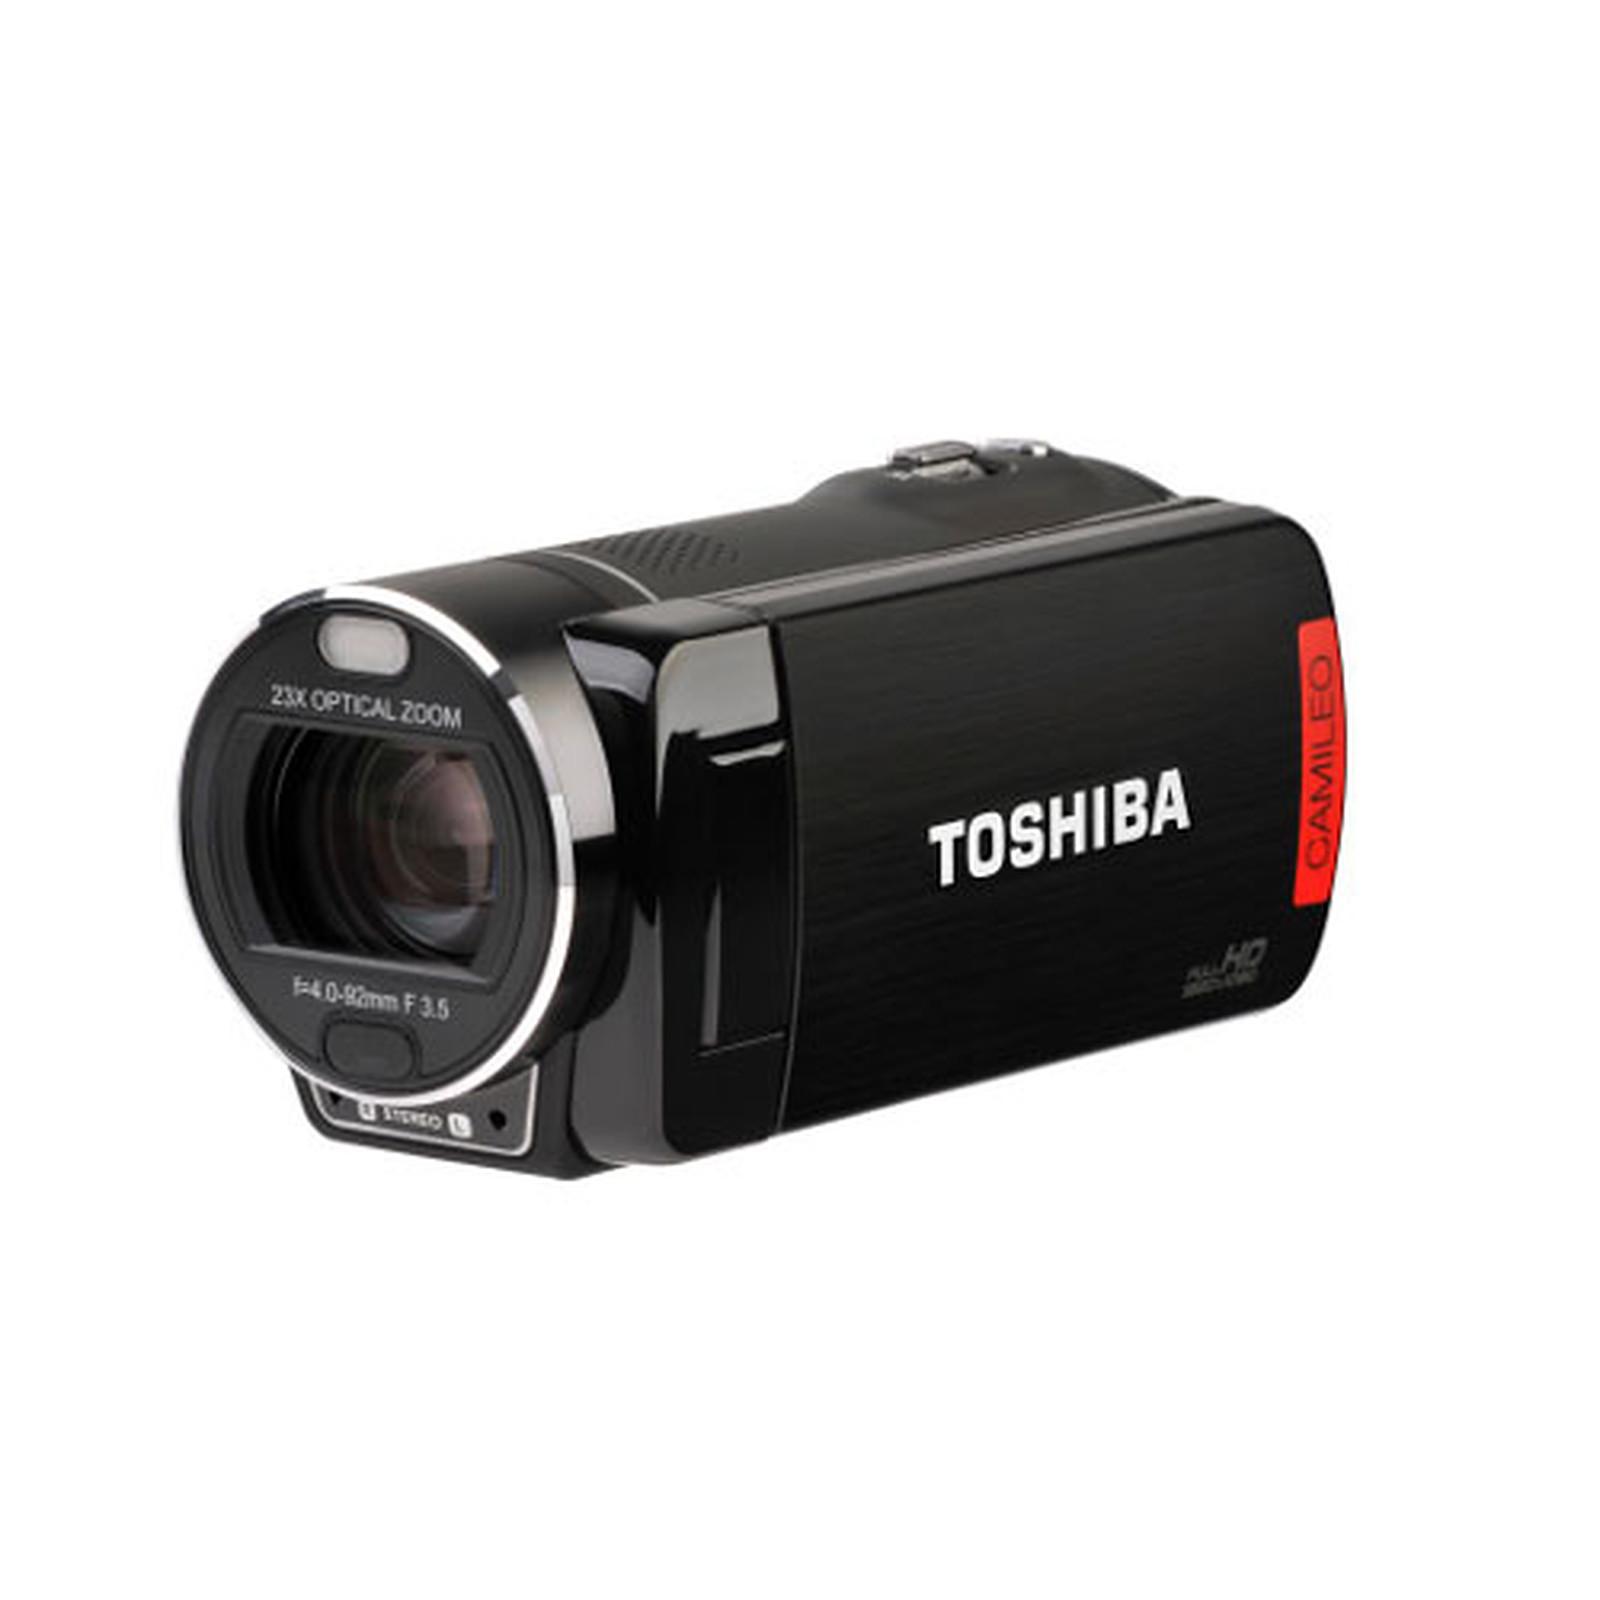 Toshiba Camileo X400 Noir